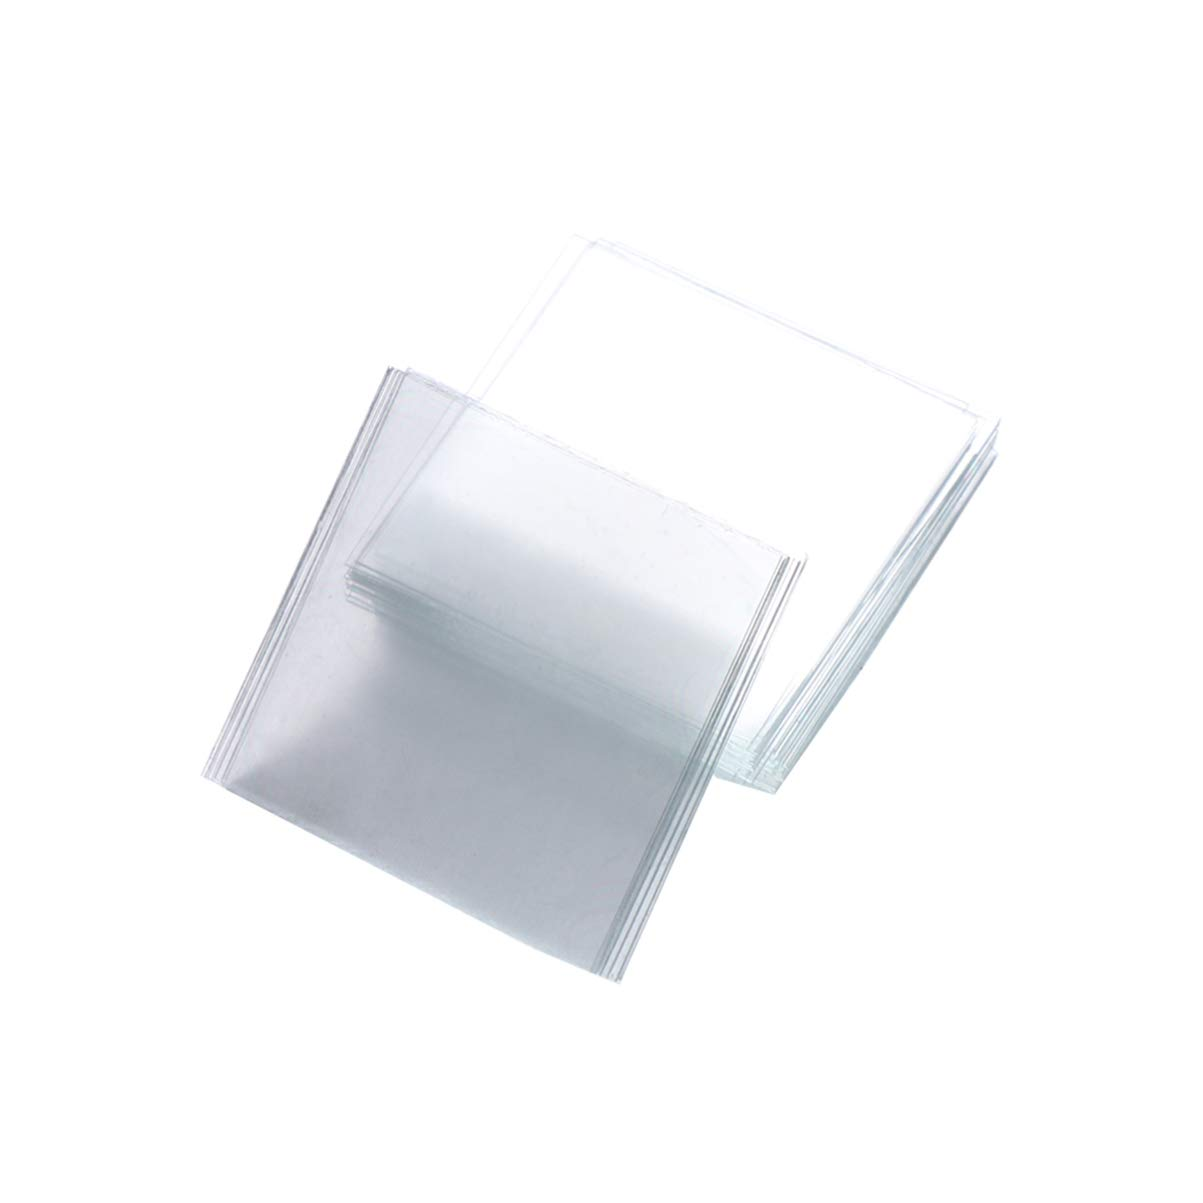 Baluue 100 PCS Financial sales sale San Antonio Mall Microscope Slides Microsc Coverslips Cleaned Pre-